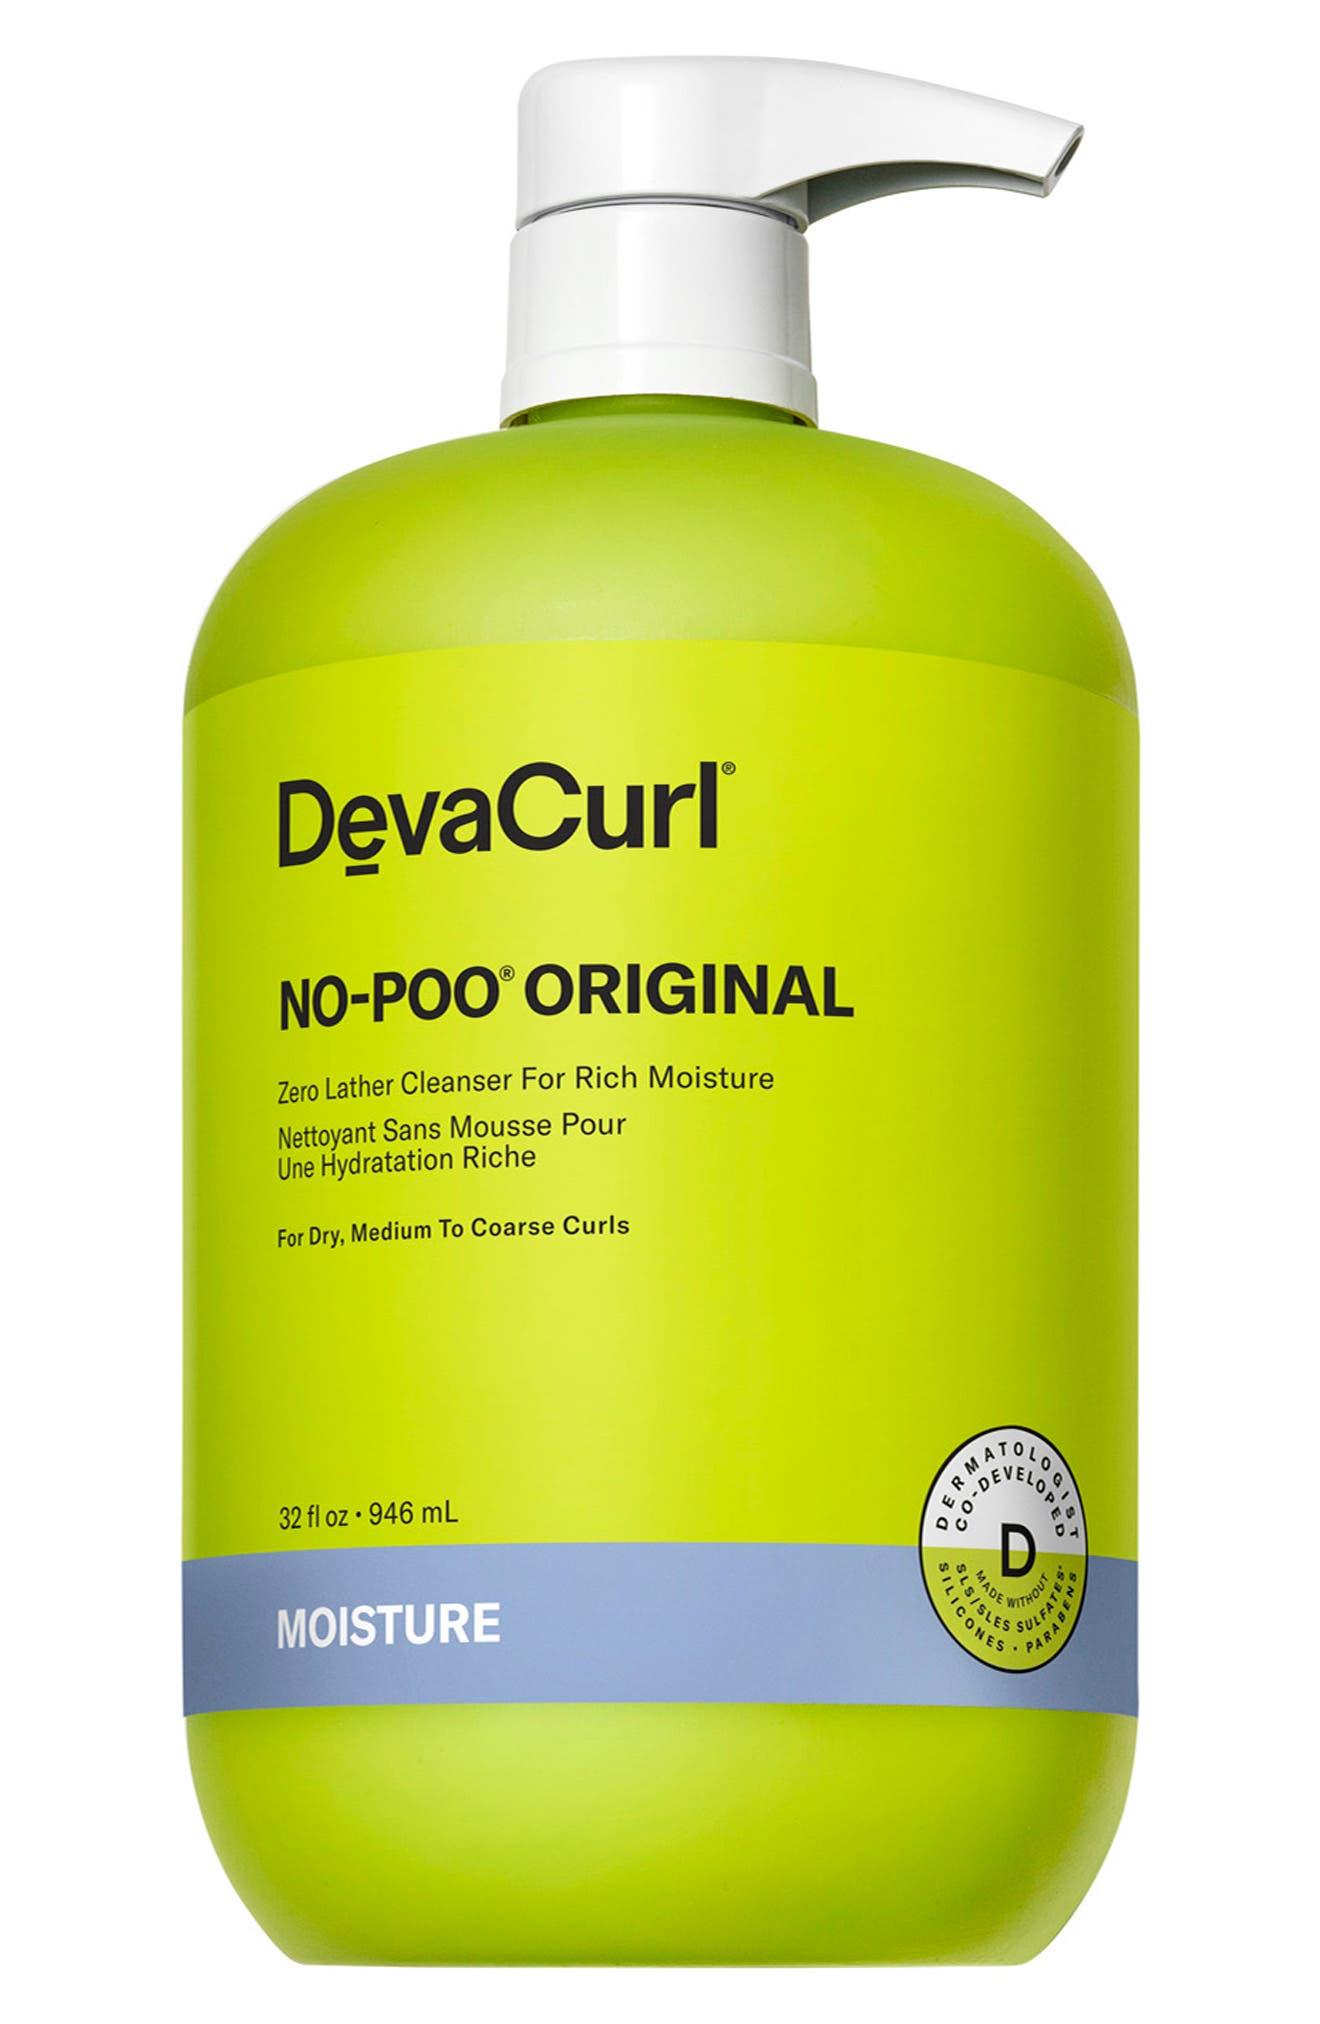 Jumbo No-Poo Original Zero Lather Cleanser